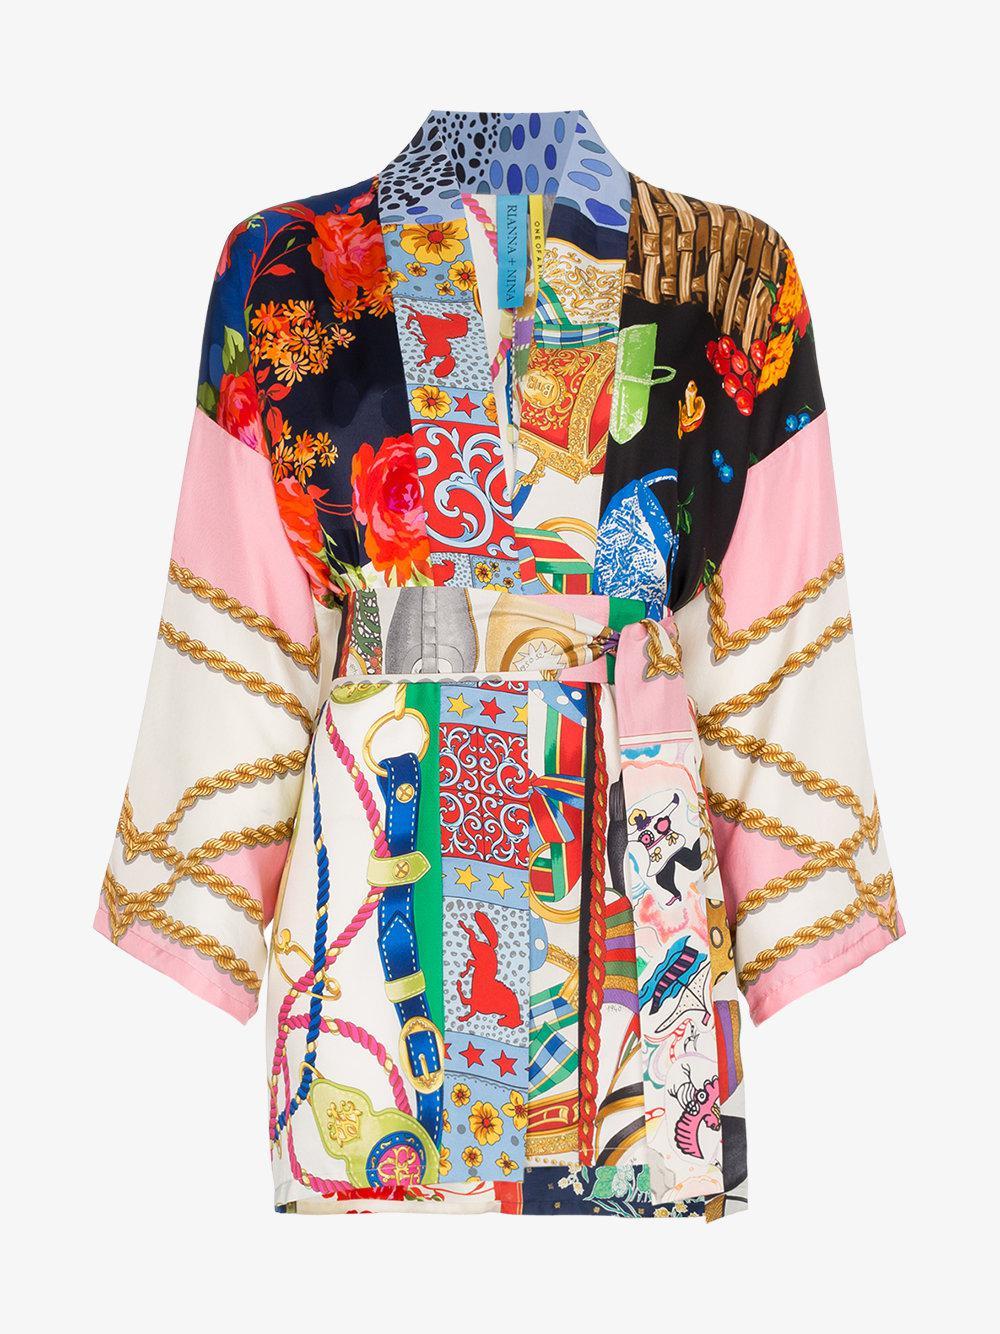 b5f3eb3bb0 ... quality design 4543e 015da Lyst - Rianna + Nina Short Multi Floral  Chain Print Silk Kim ...